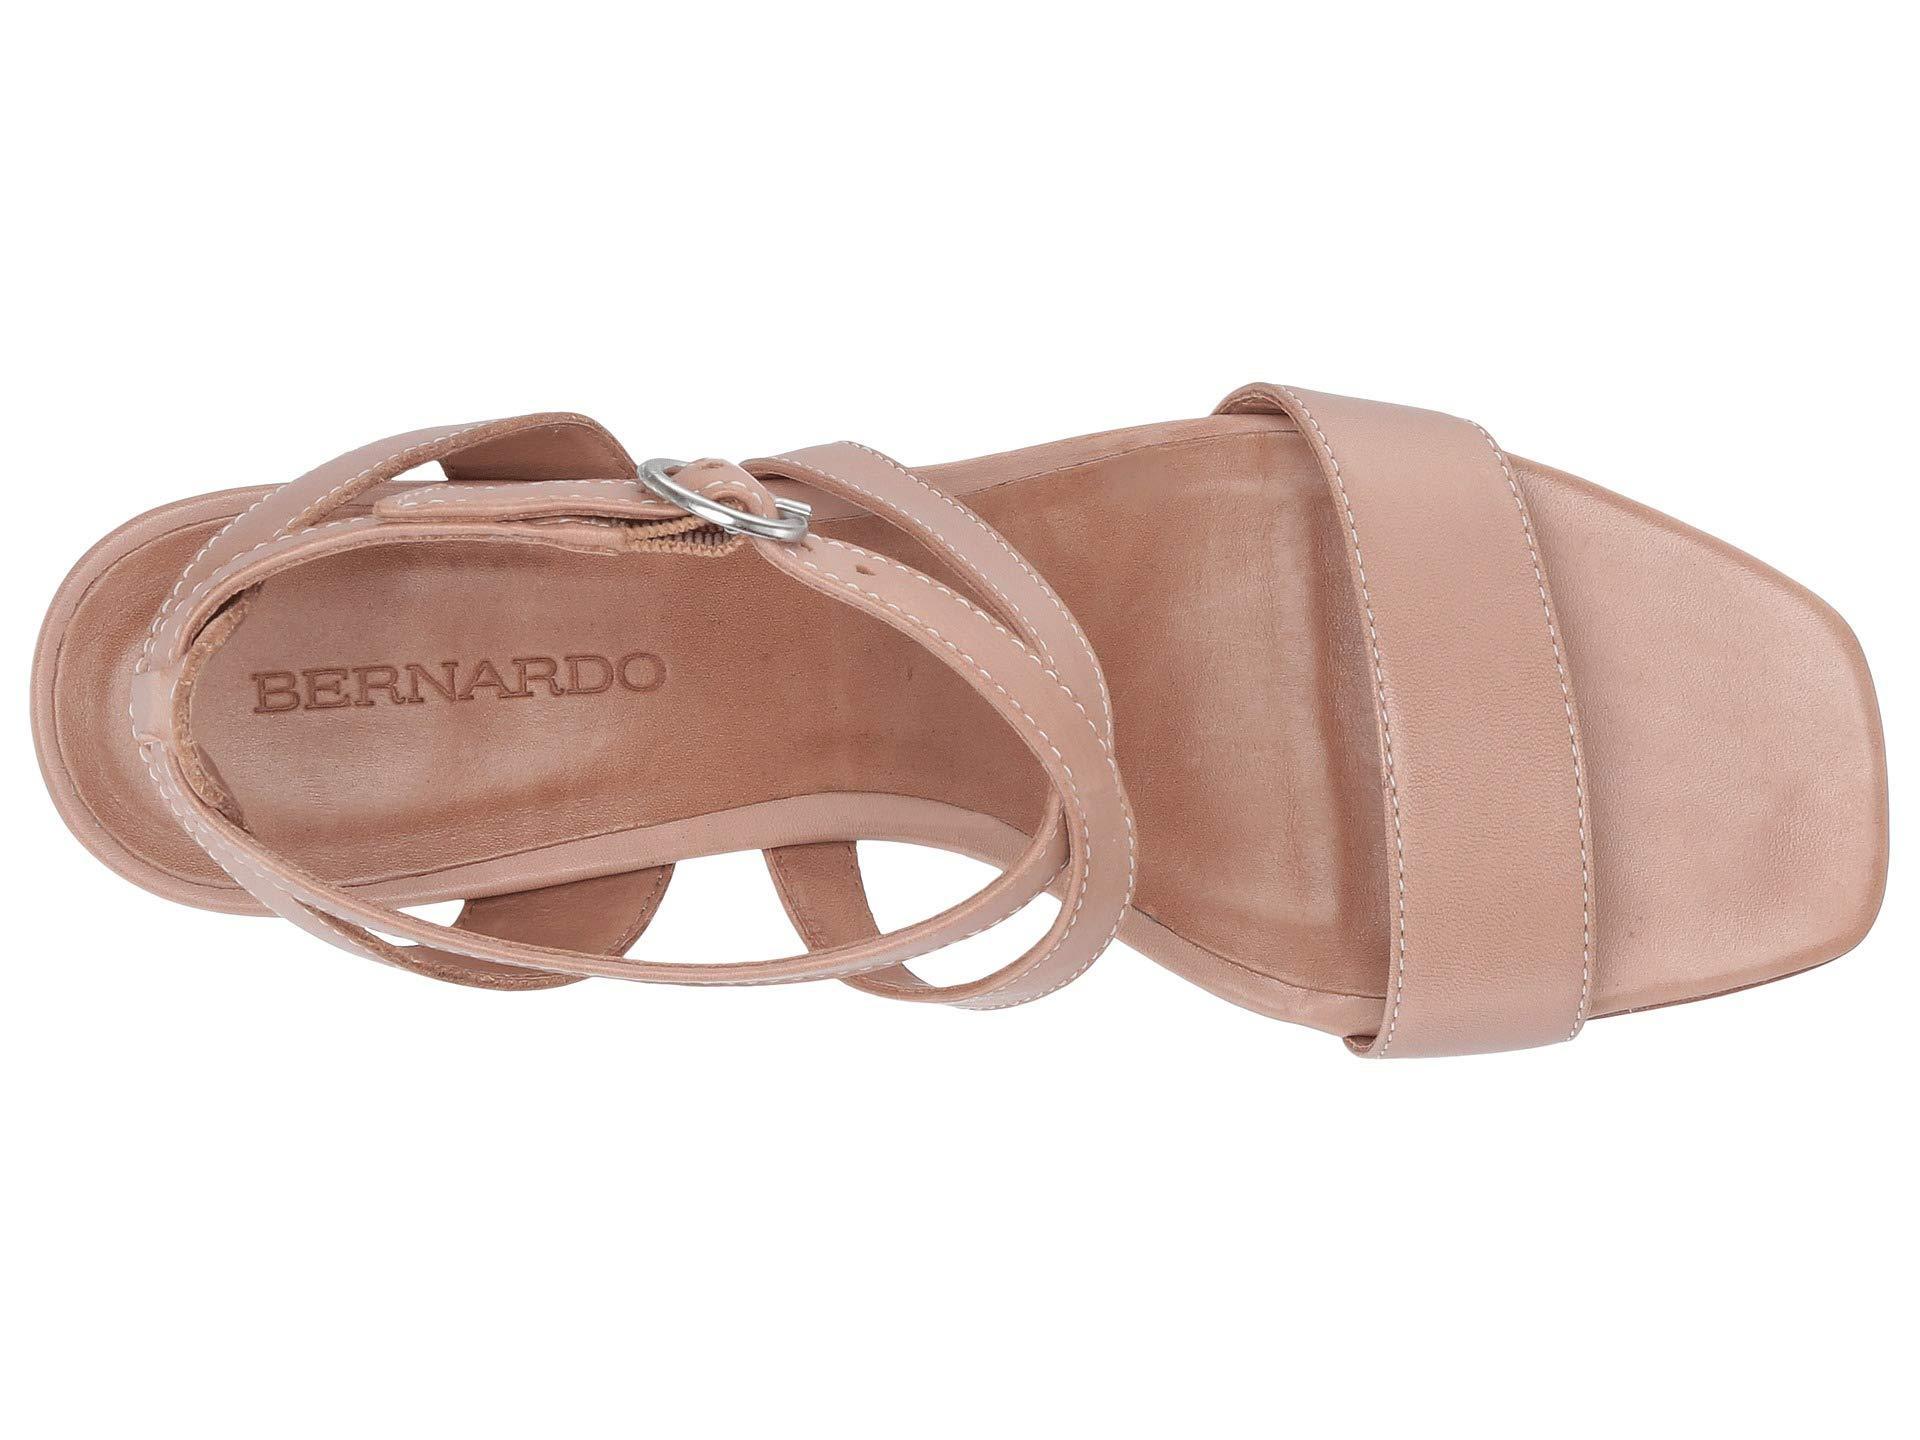 4dac7033b49 Lyst - Bernardo Brielle Heeled Sandal (blush Antique Calf) Women s ...